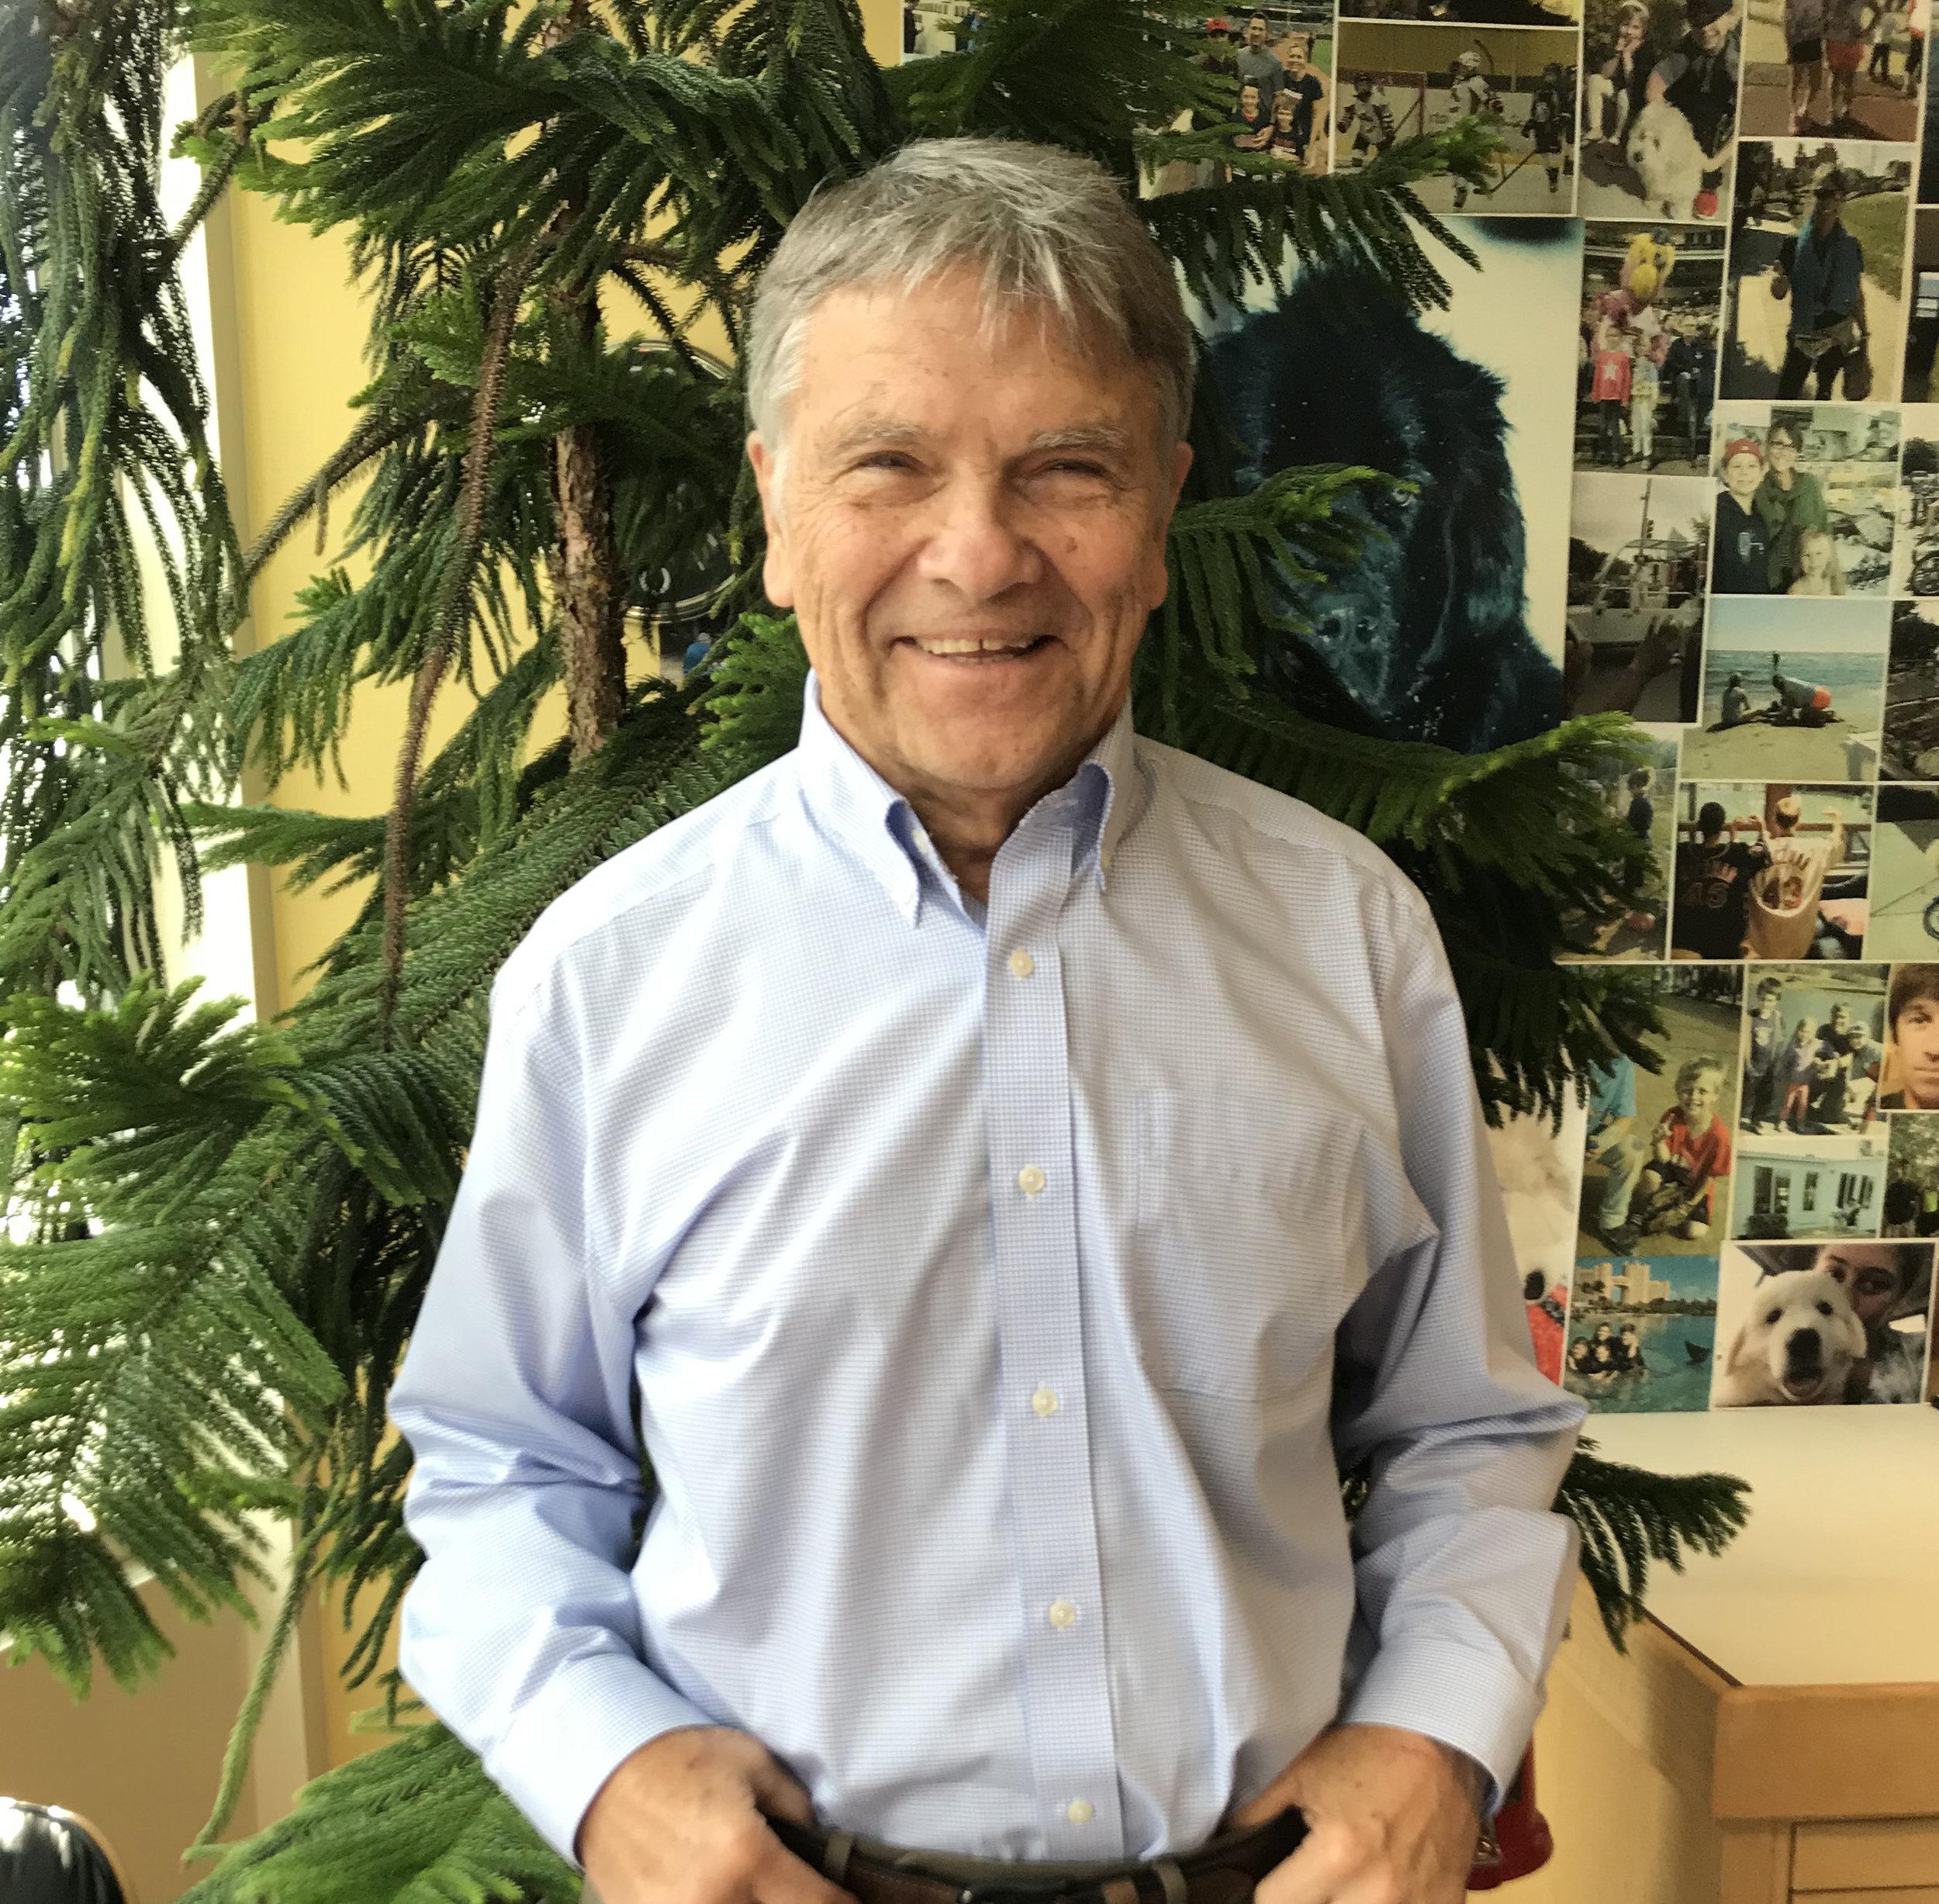 Stan Kaczmar - OWNERLEARN MORE